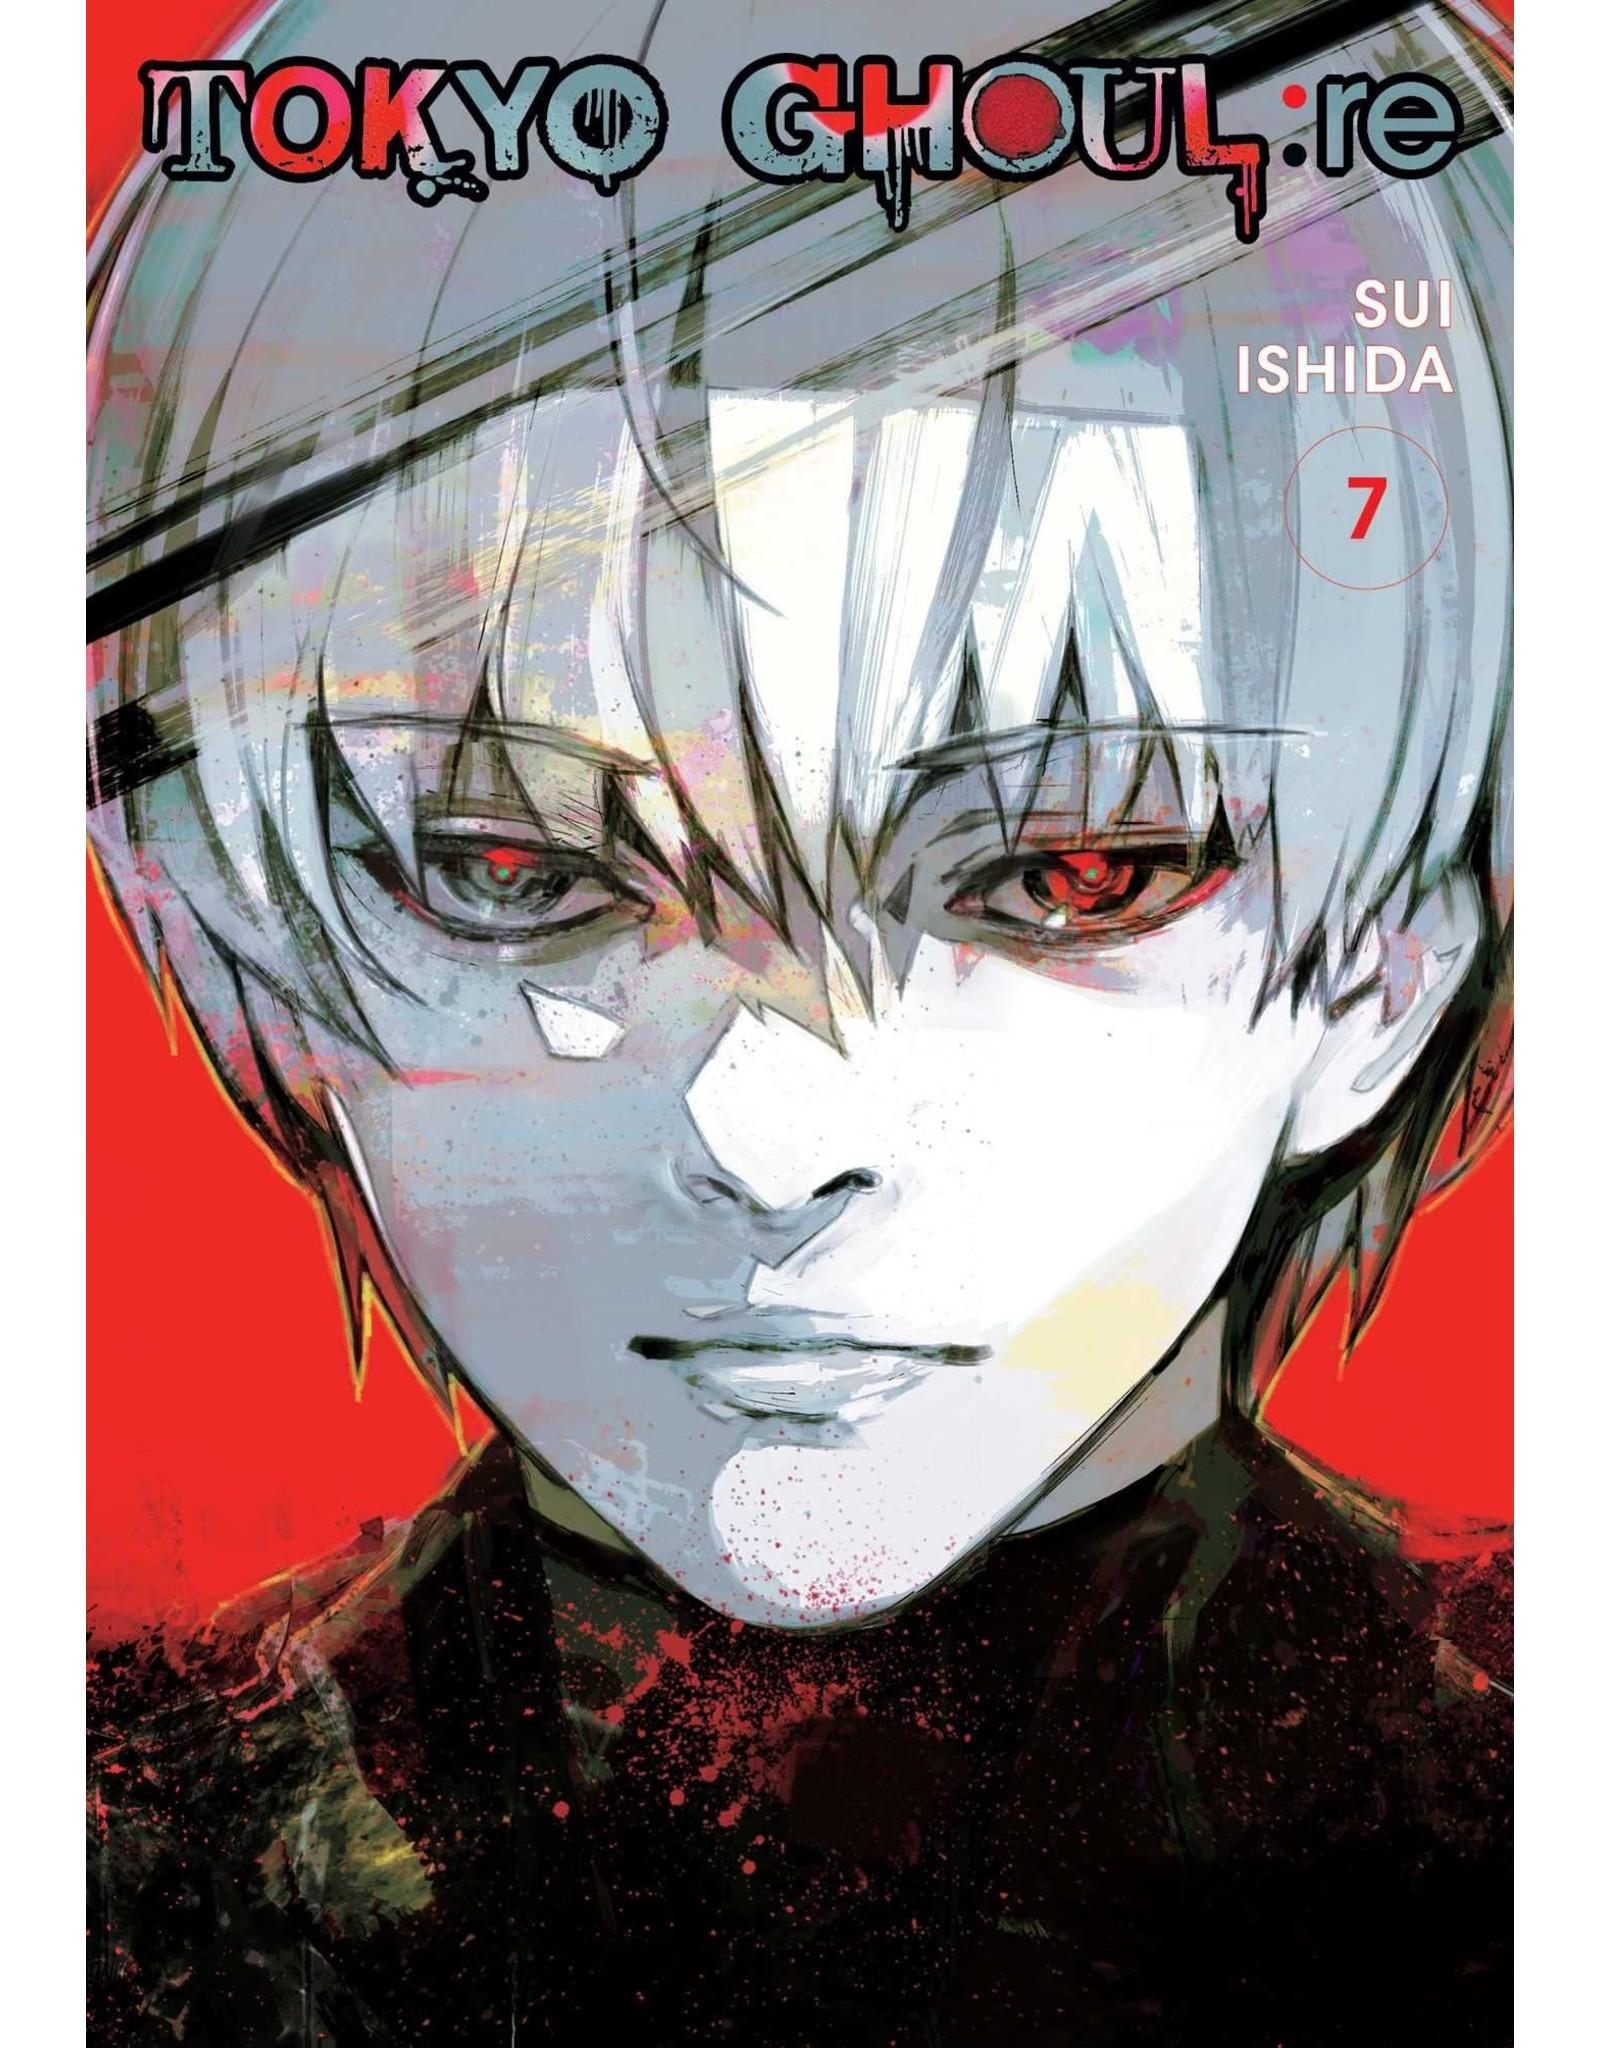 Tokyo Ghoul:re 07 (English Version)